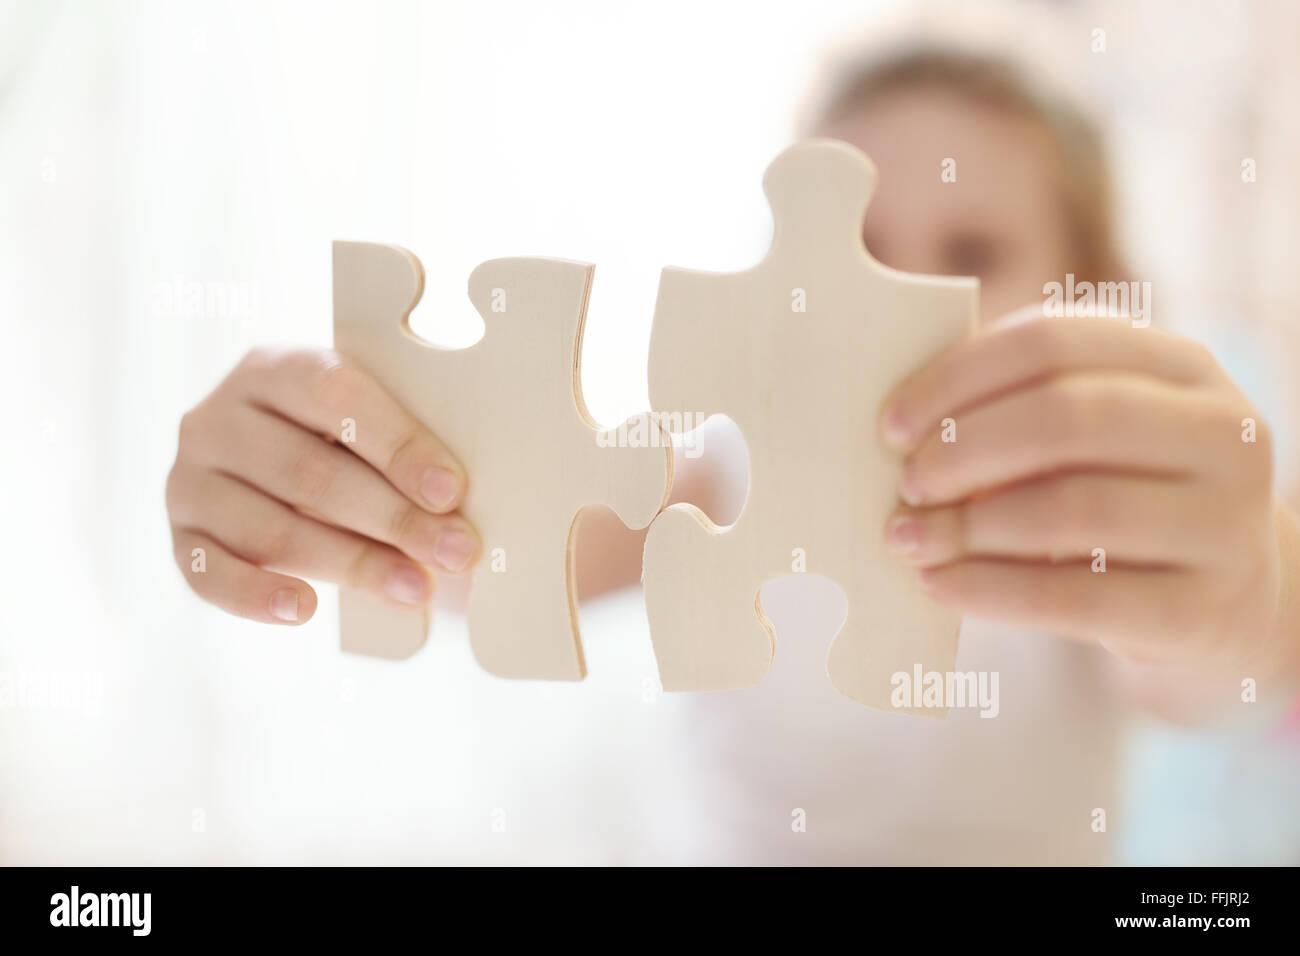 Puzzle Pieces Stock Photos & Puzzle Pieces Stock Images - Alamy